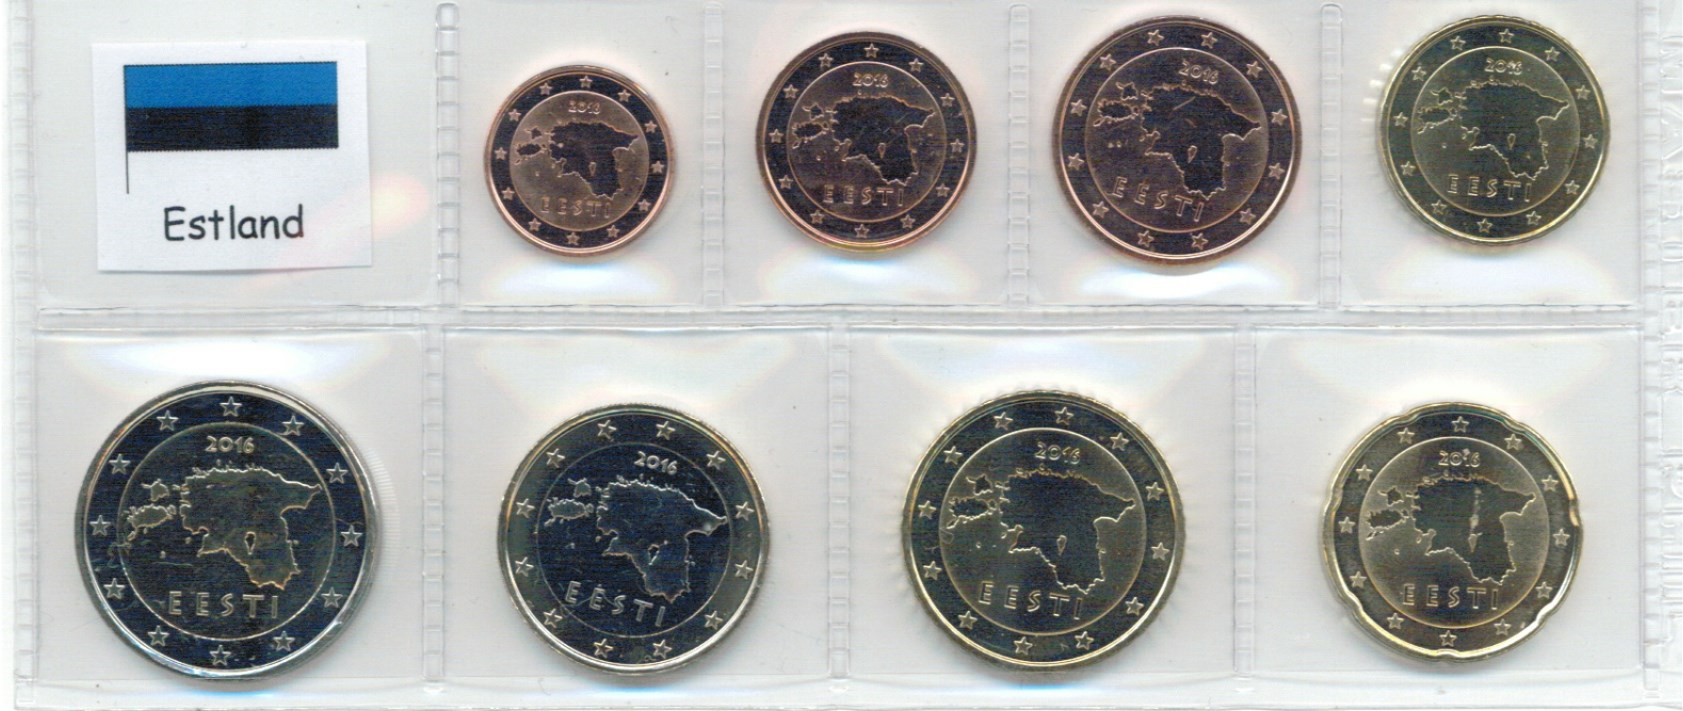 Coin Serie Estonia 2018 1 Cent To 2 Euro Graf Waldschratde